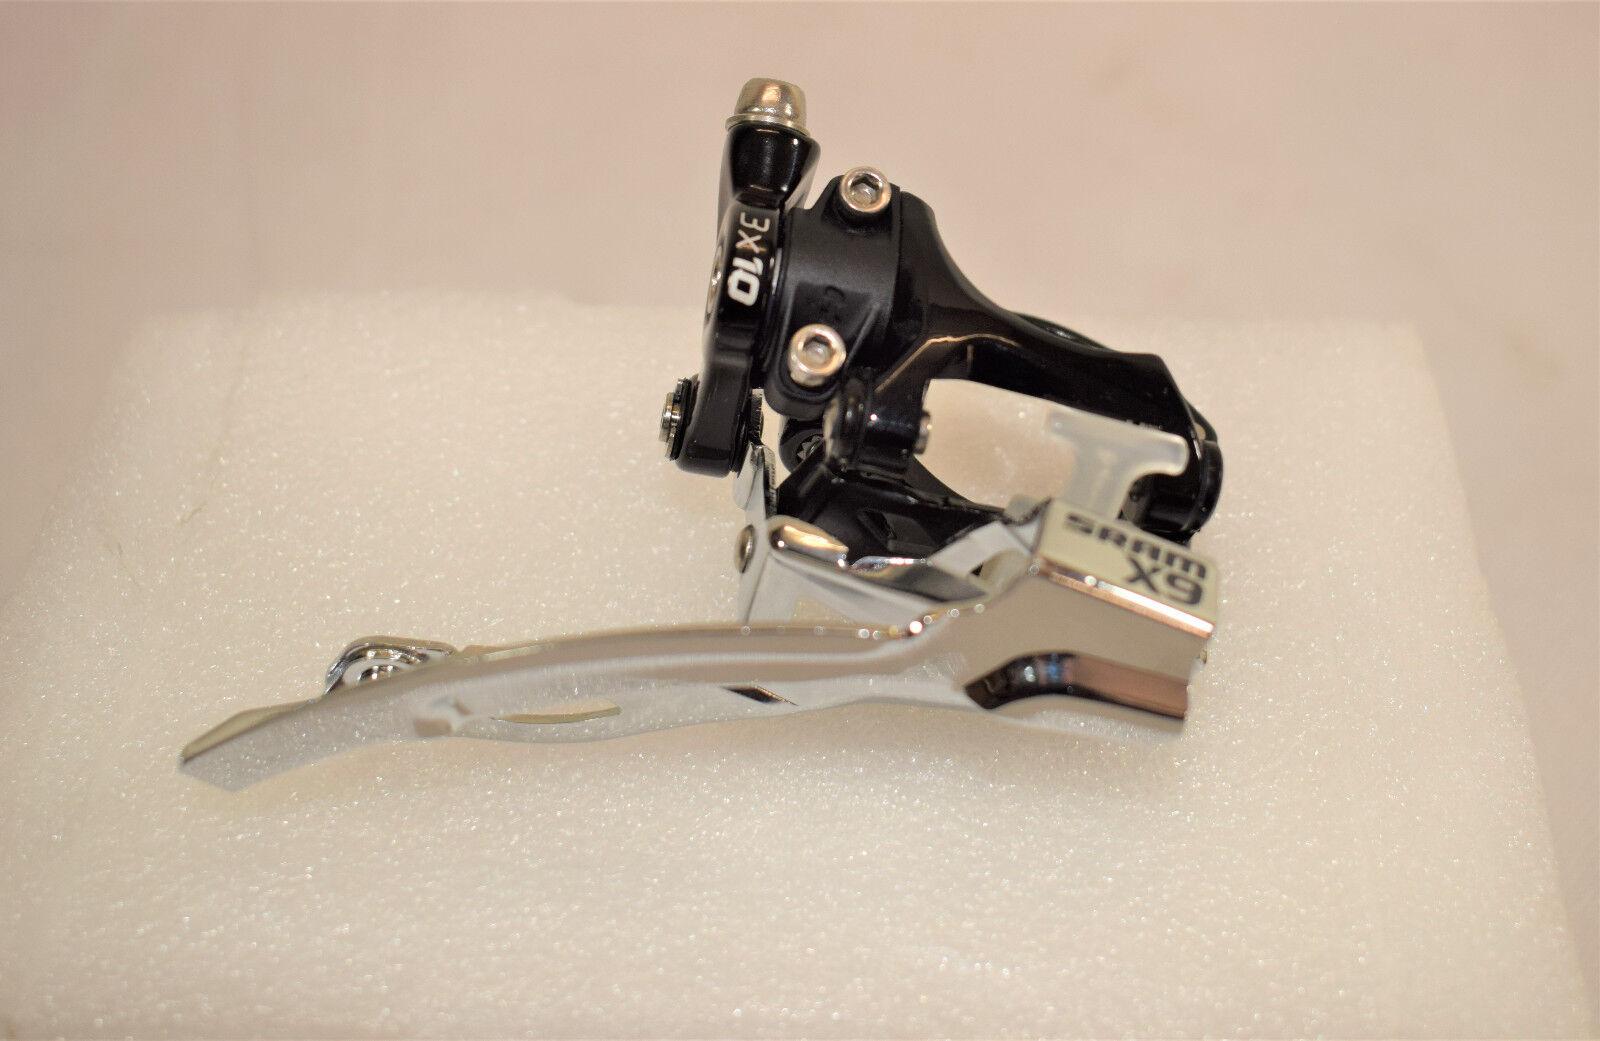 1 Sram X9, 3x10,Umwerfer,Neu, Bottom Pull, Low Clamp, High Swing, 35,0mm St006  | Vorzugspreis